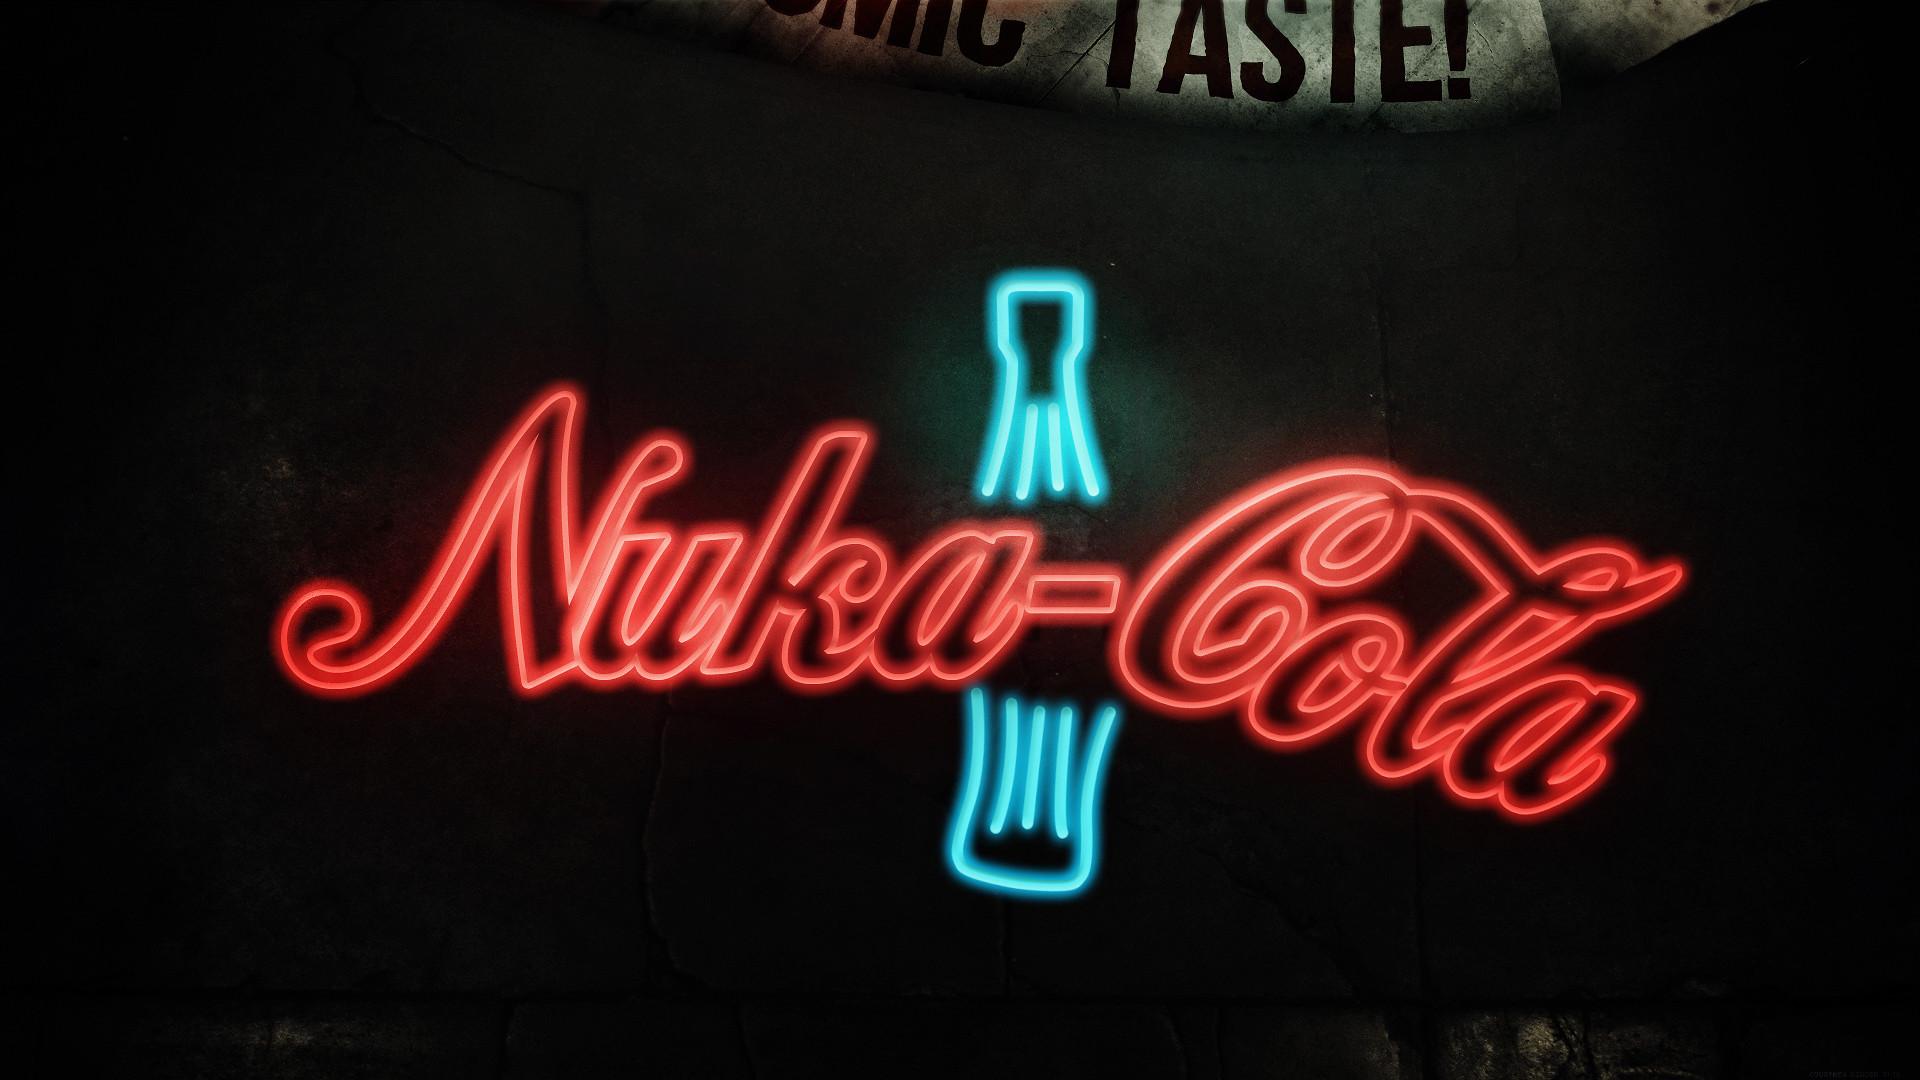 Nuka-Cola Soda Sign Neon Bottle Fallout HD wallpaper thumb